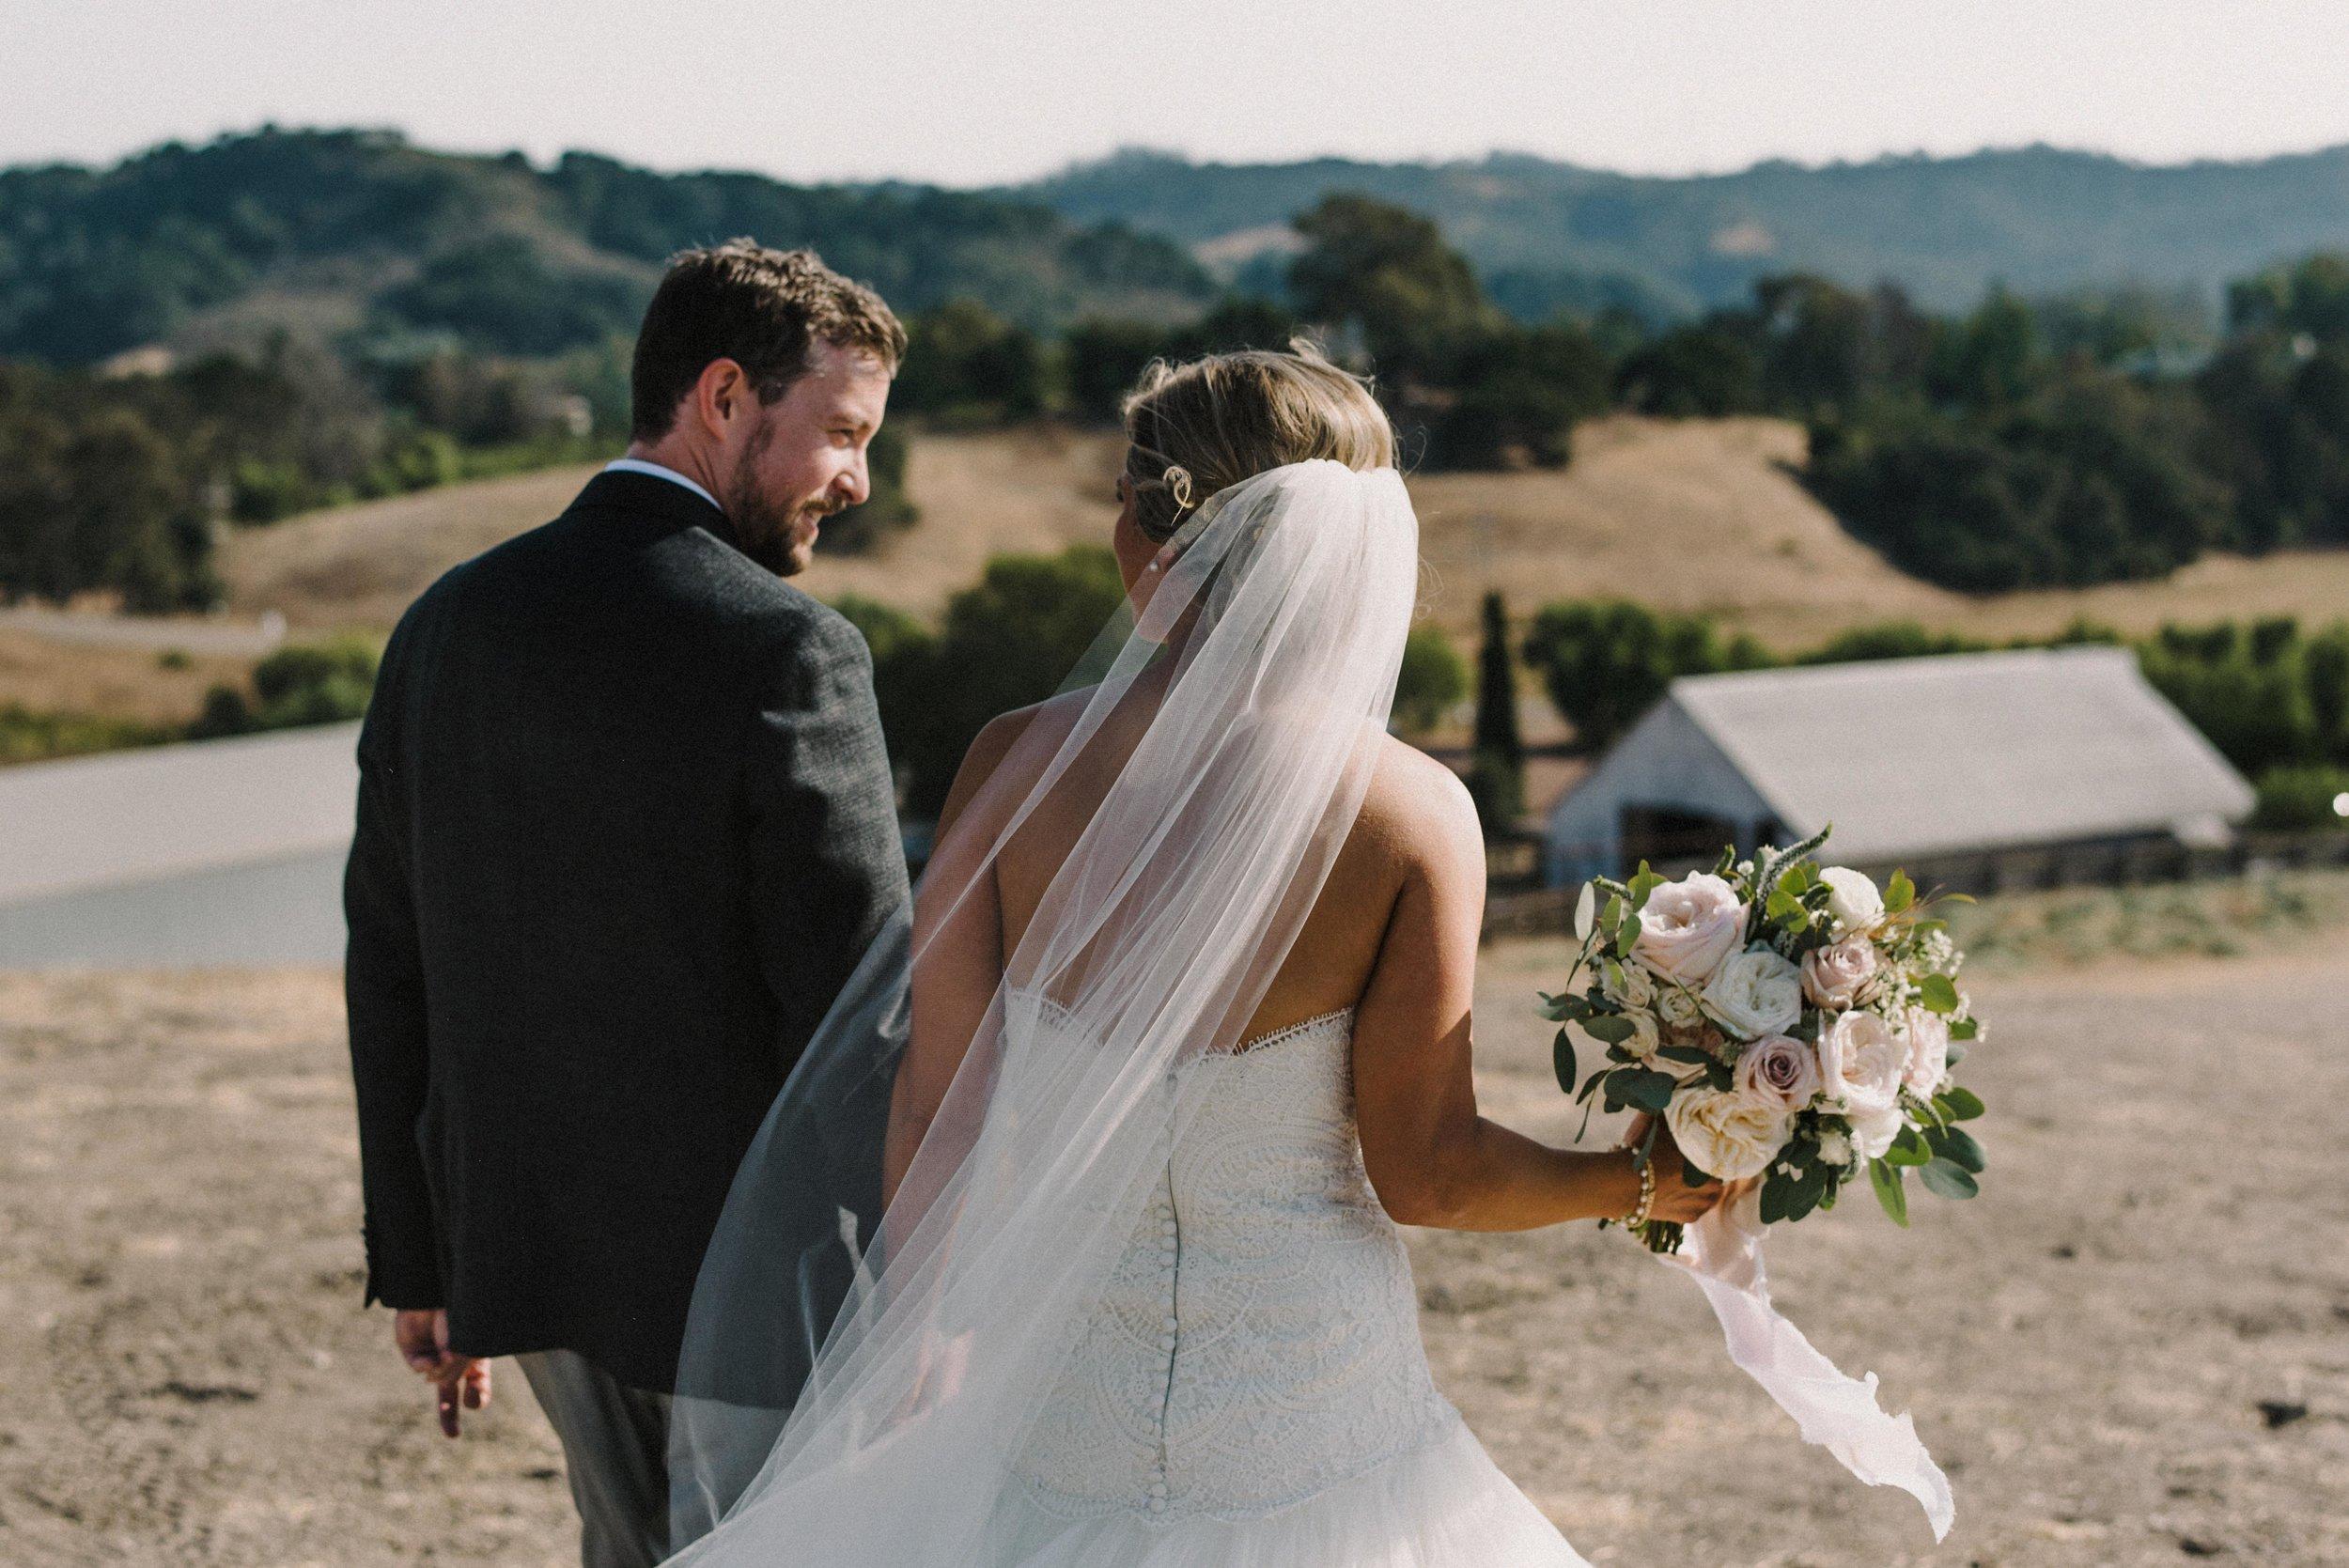 spreafico-farm-wedding-loveridge-photography-aurelia-flora0143.jpg